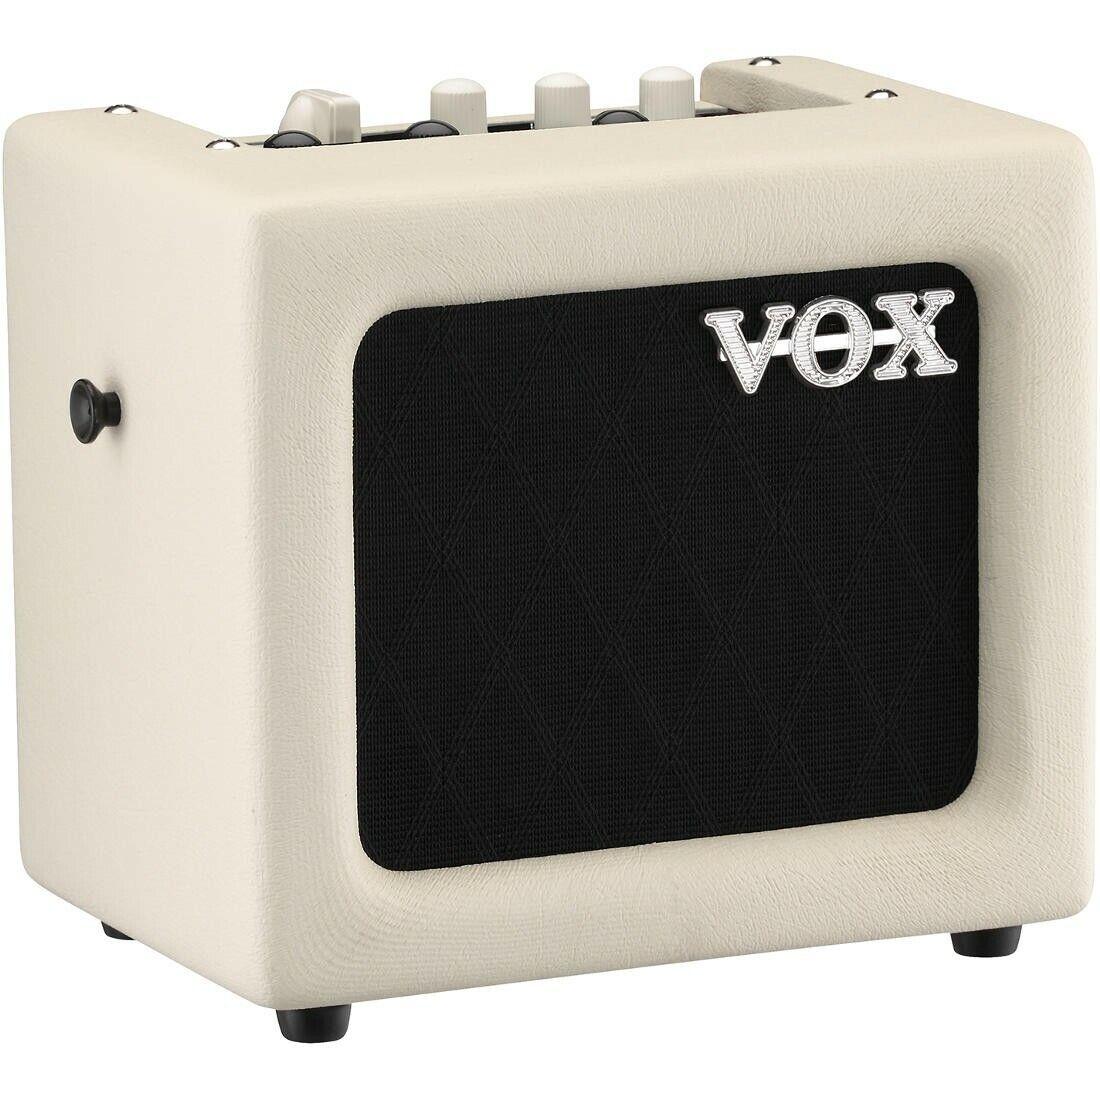 VOX MINI 3 G2 IVORY MODELING AMP - NEU